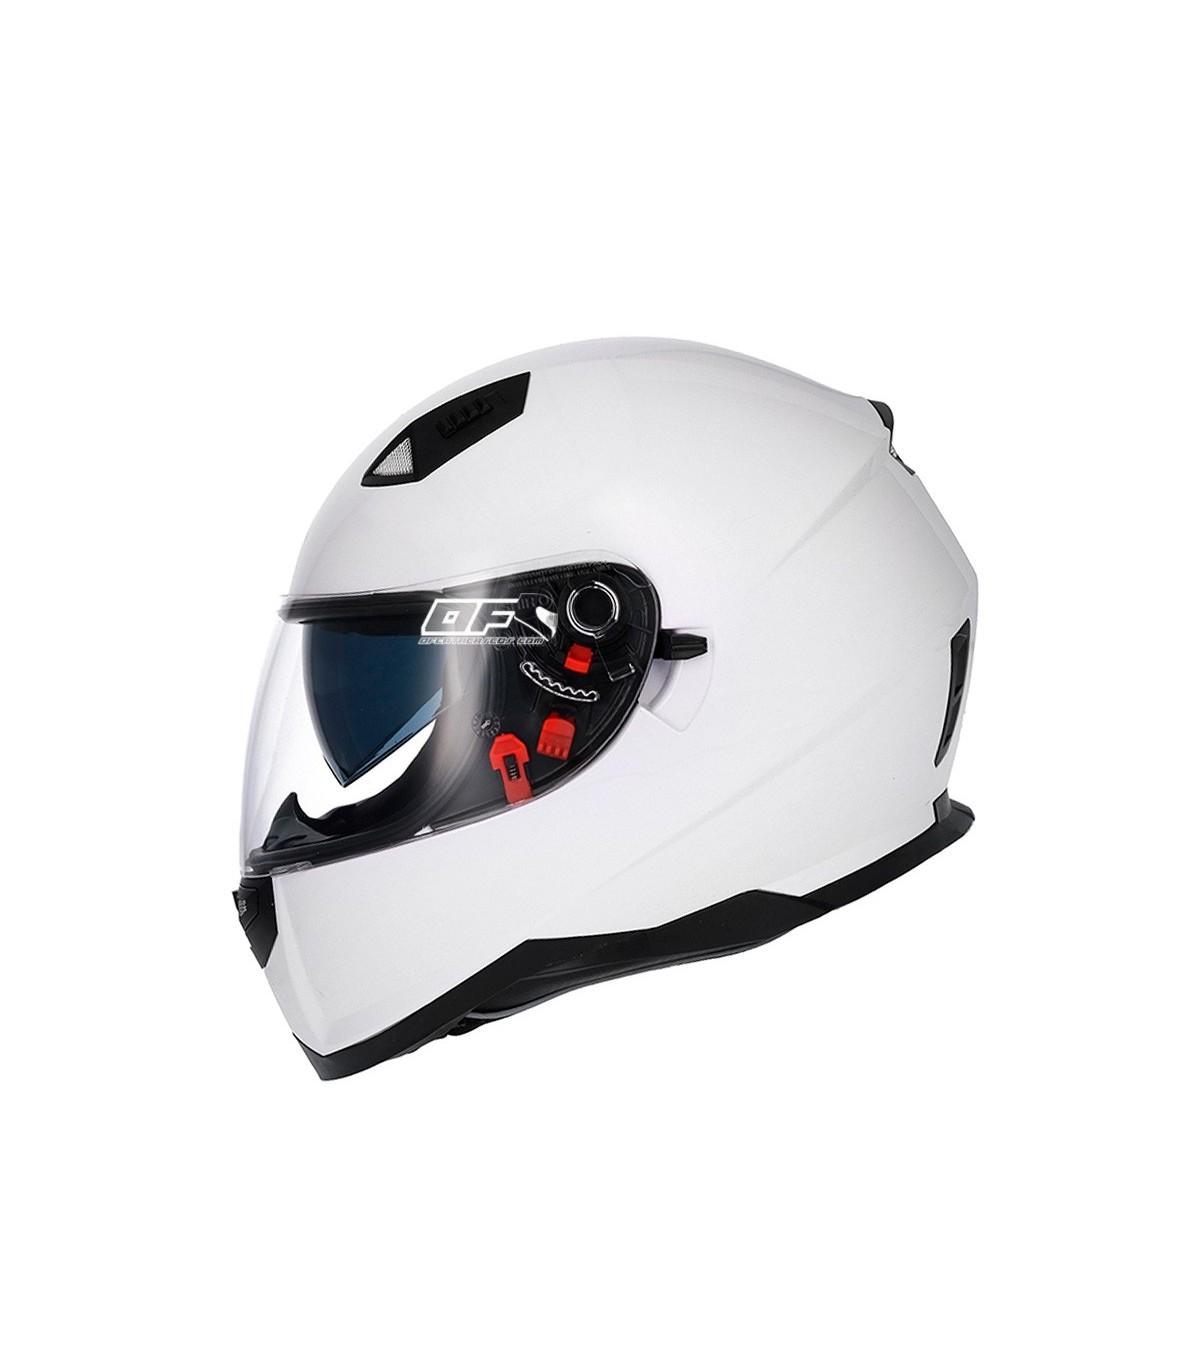 SHIRO SH-881 MONOCOLOR color blanco